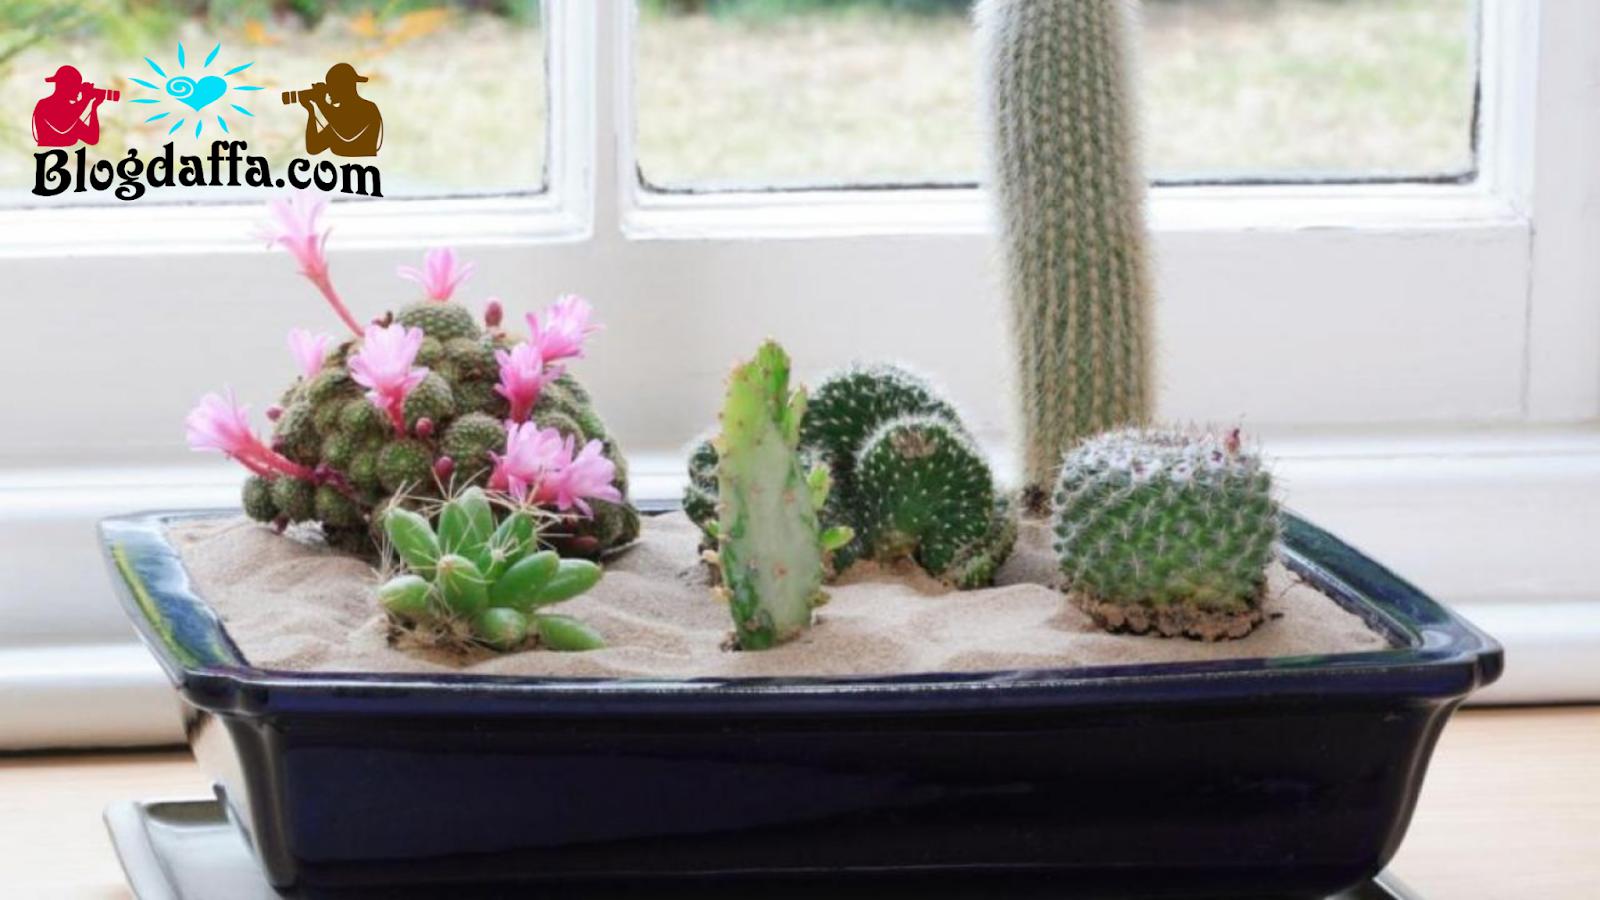 Fungsi tanaman hias kaktus